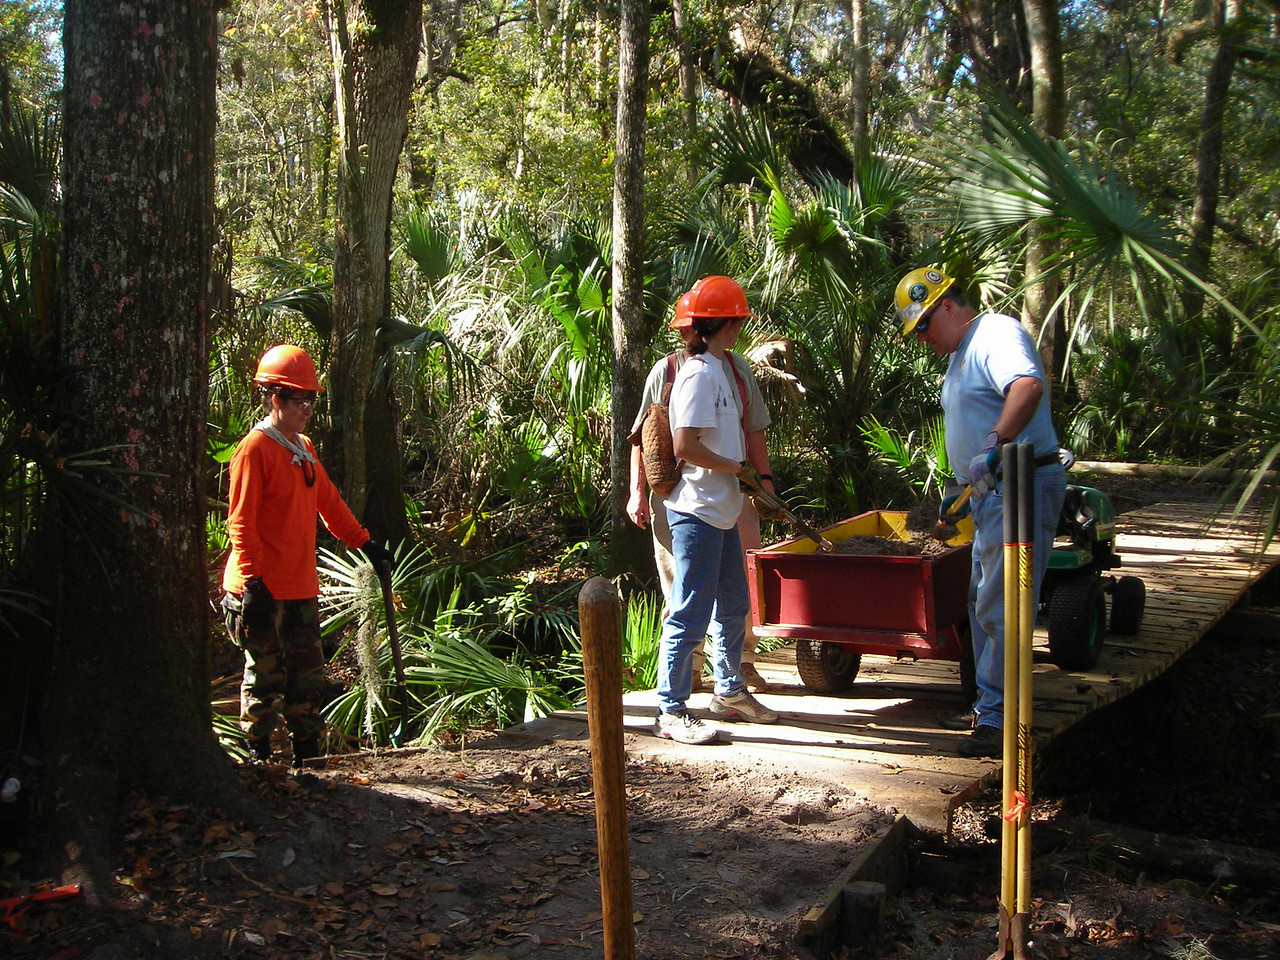 Working on the Hillsborough River Trail<br /> Megan Eno / Florida Trail Association